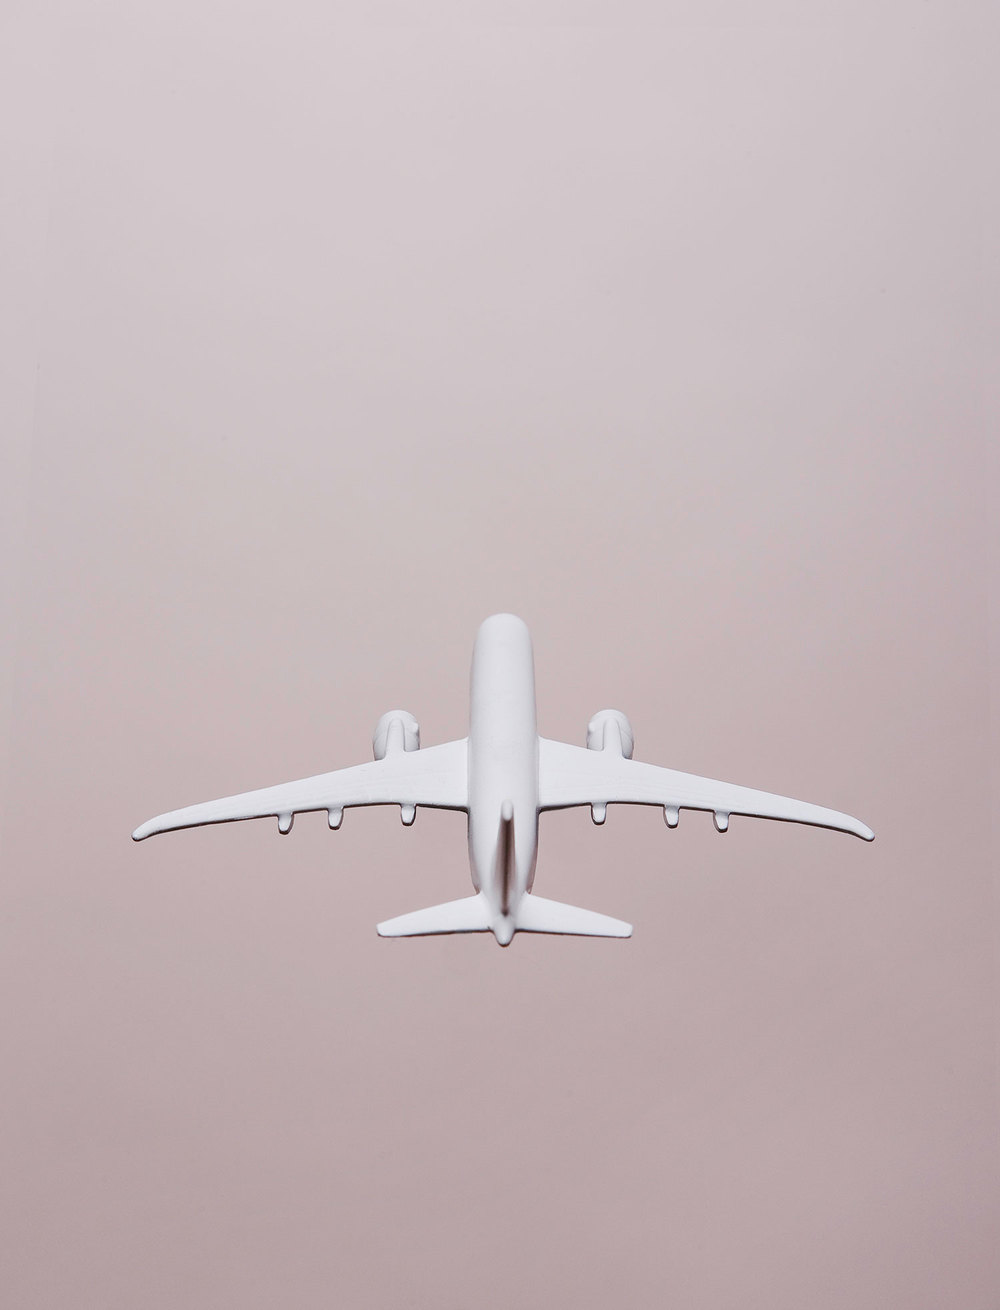 plane_forweb.jpg